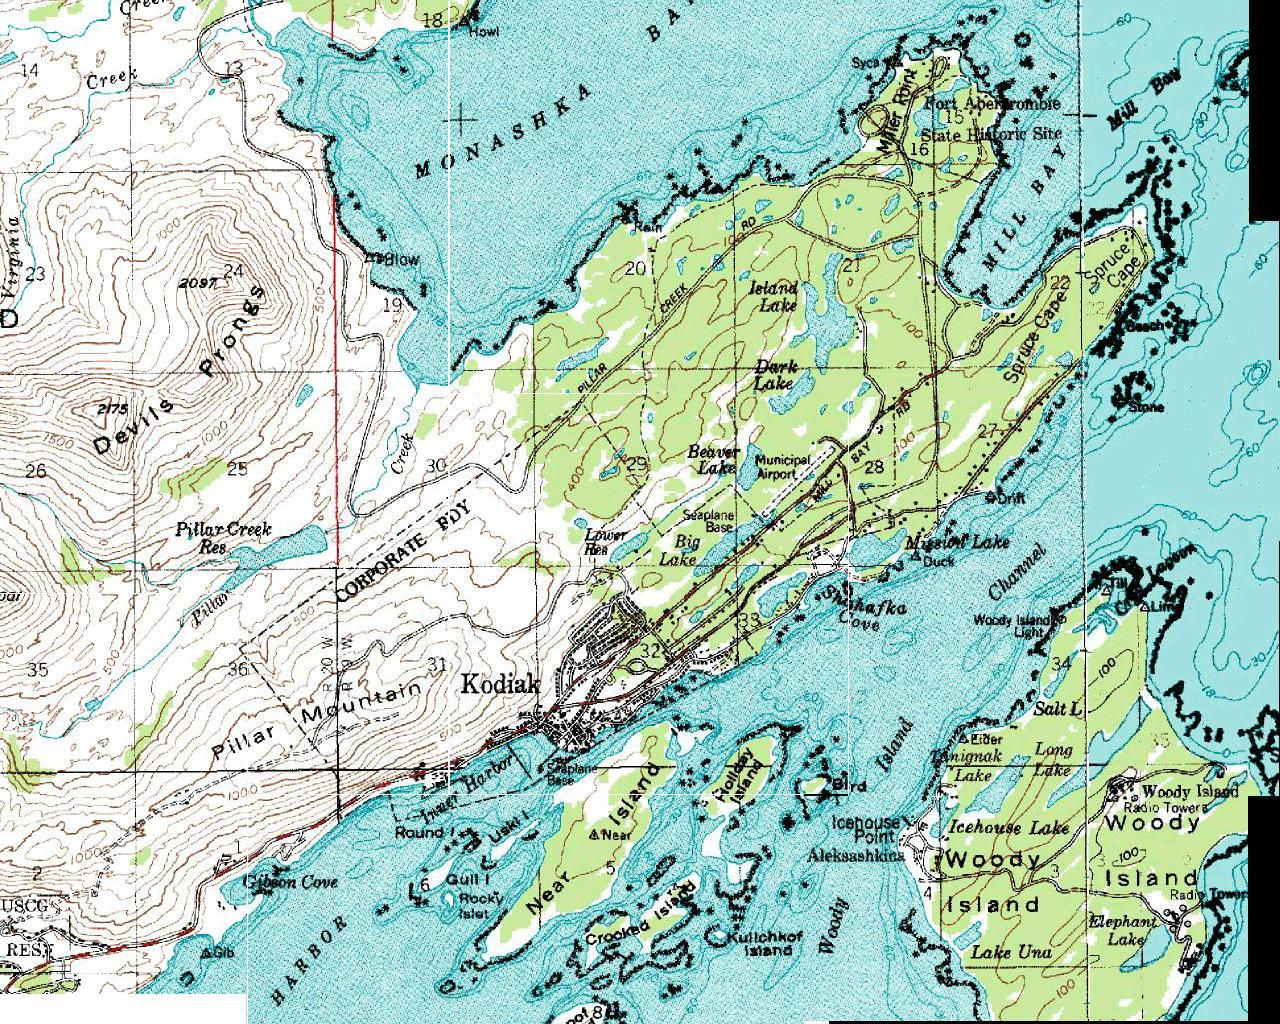 Kodiak Island Alaska Map.Kodiak Alaska Military History Maps